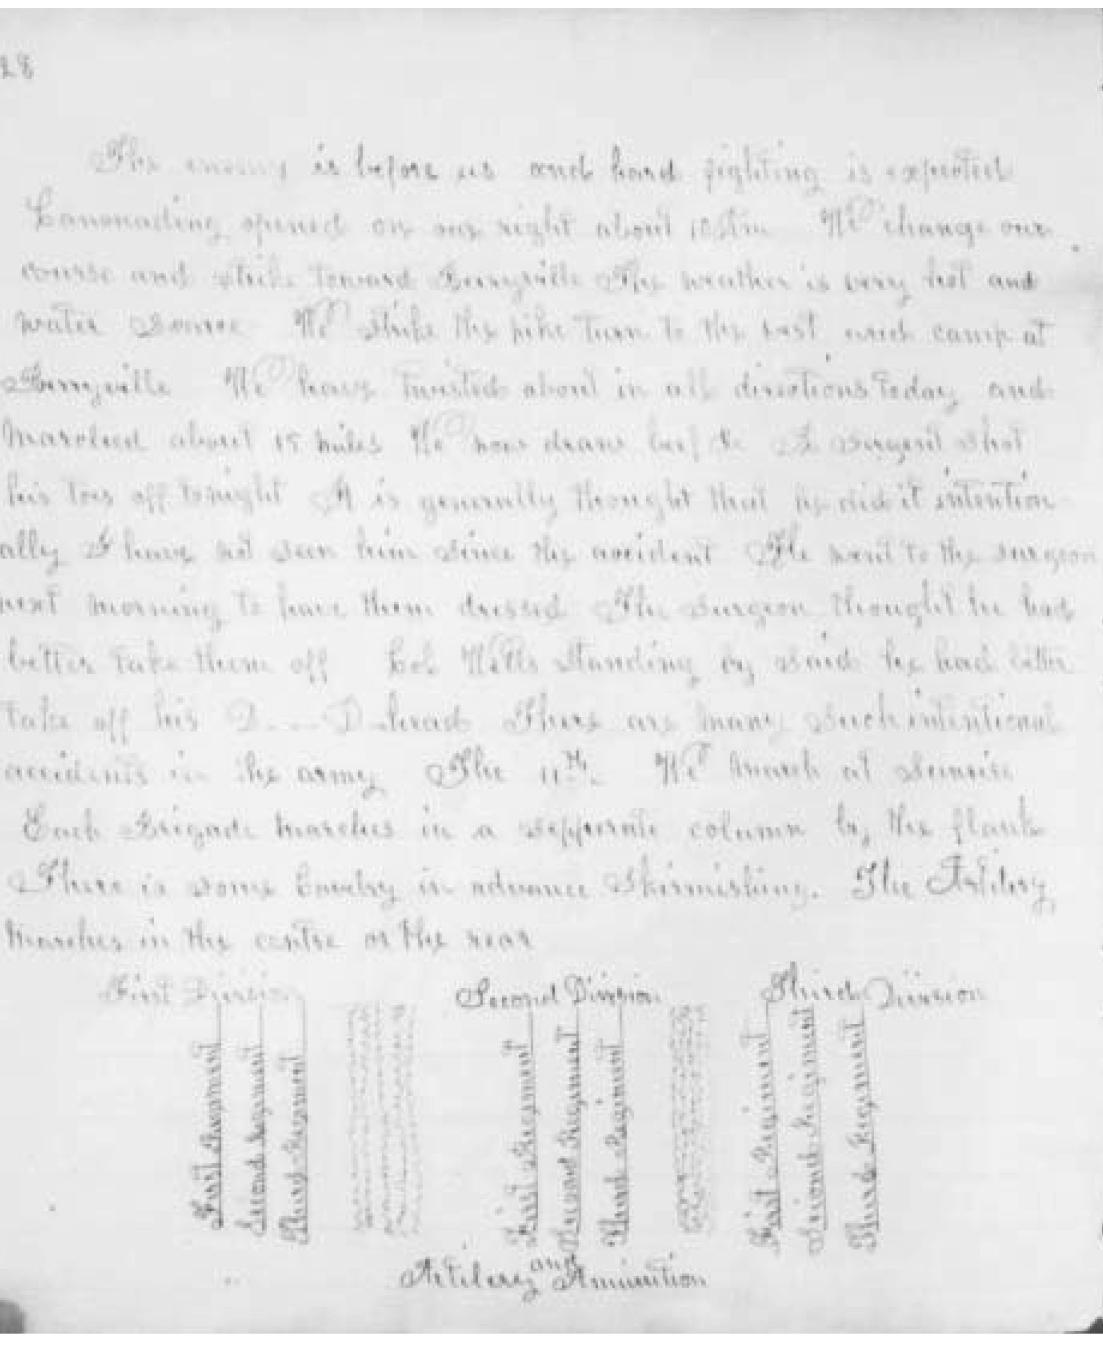 grievo civil war document-2.jpg